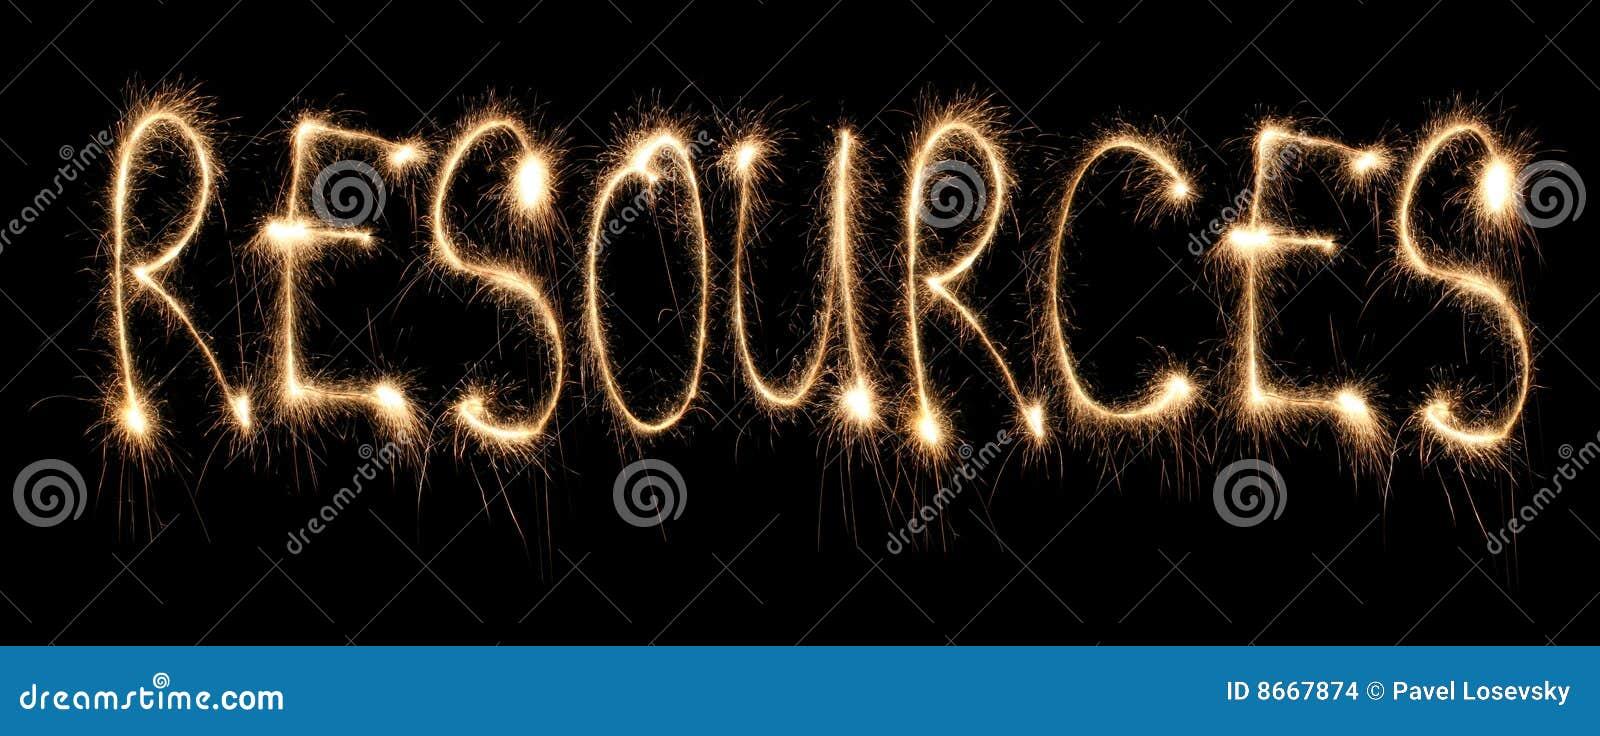 Download Word Resources Written Sparkler Stock Photo - Image of night, british: 8667874